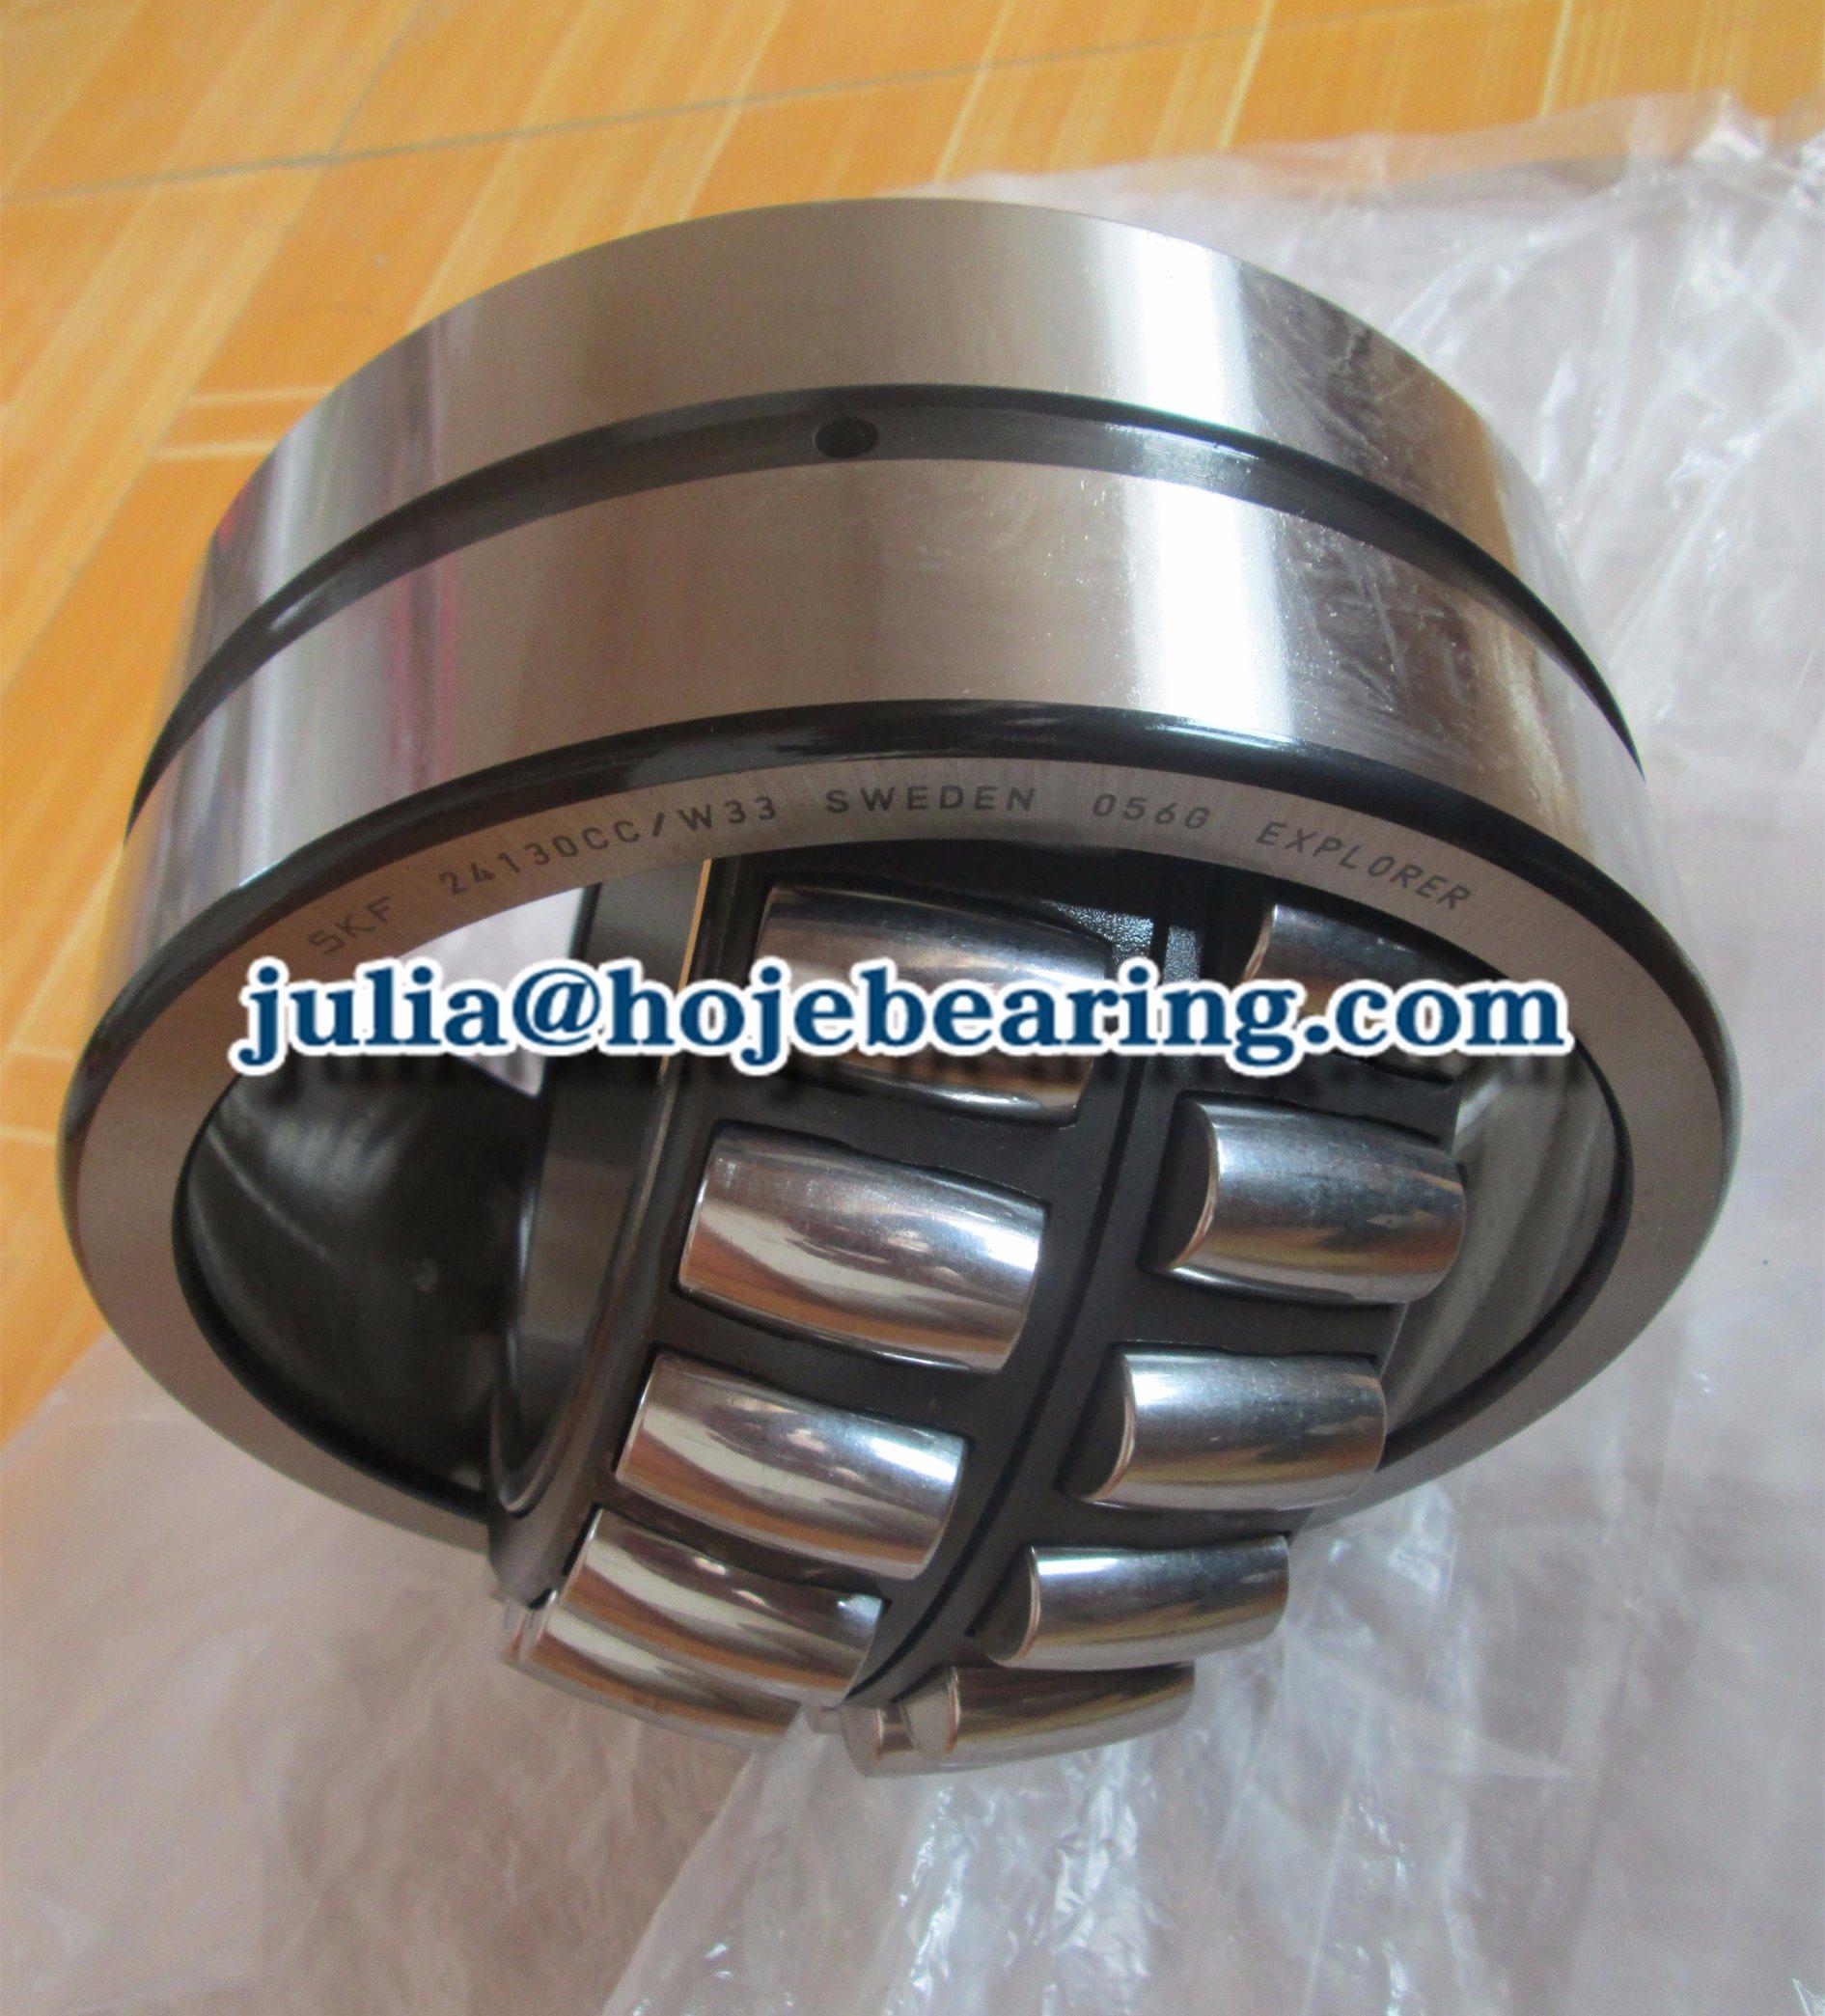 21314 Spherical Bearing Catalog Hot Selling Spherical Roller Bearing 21314